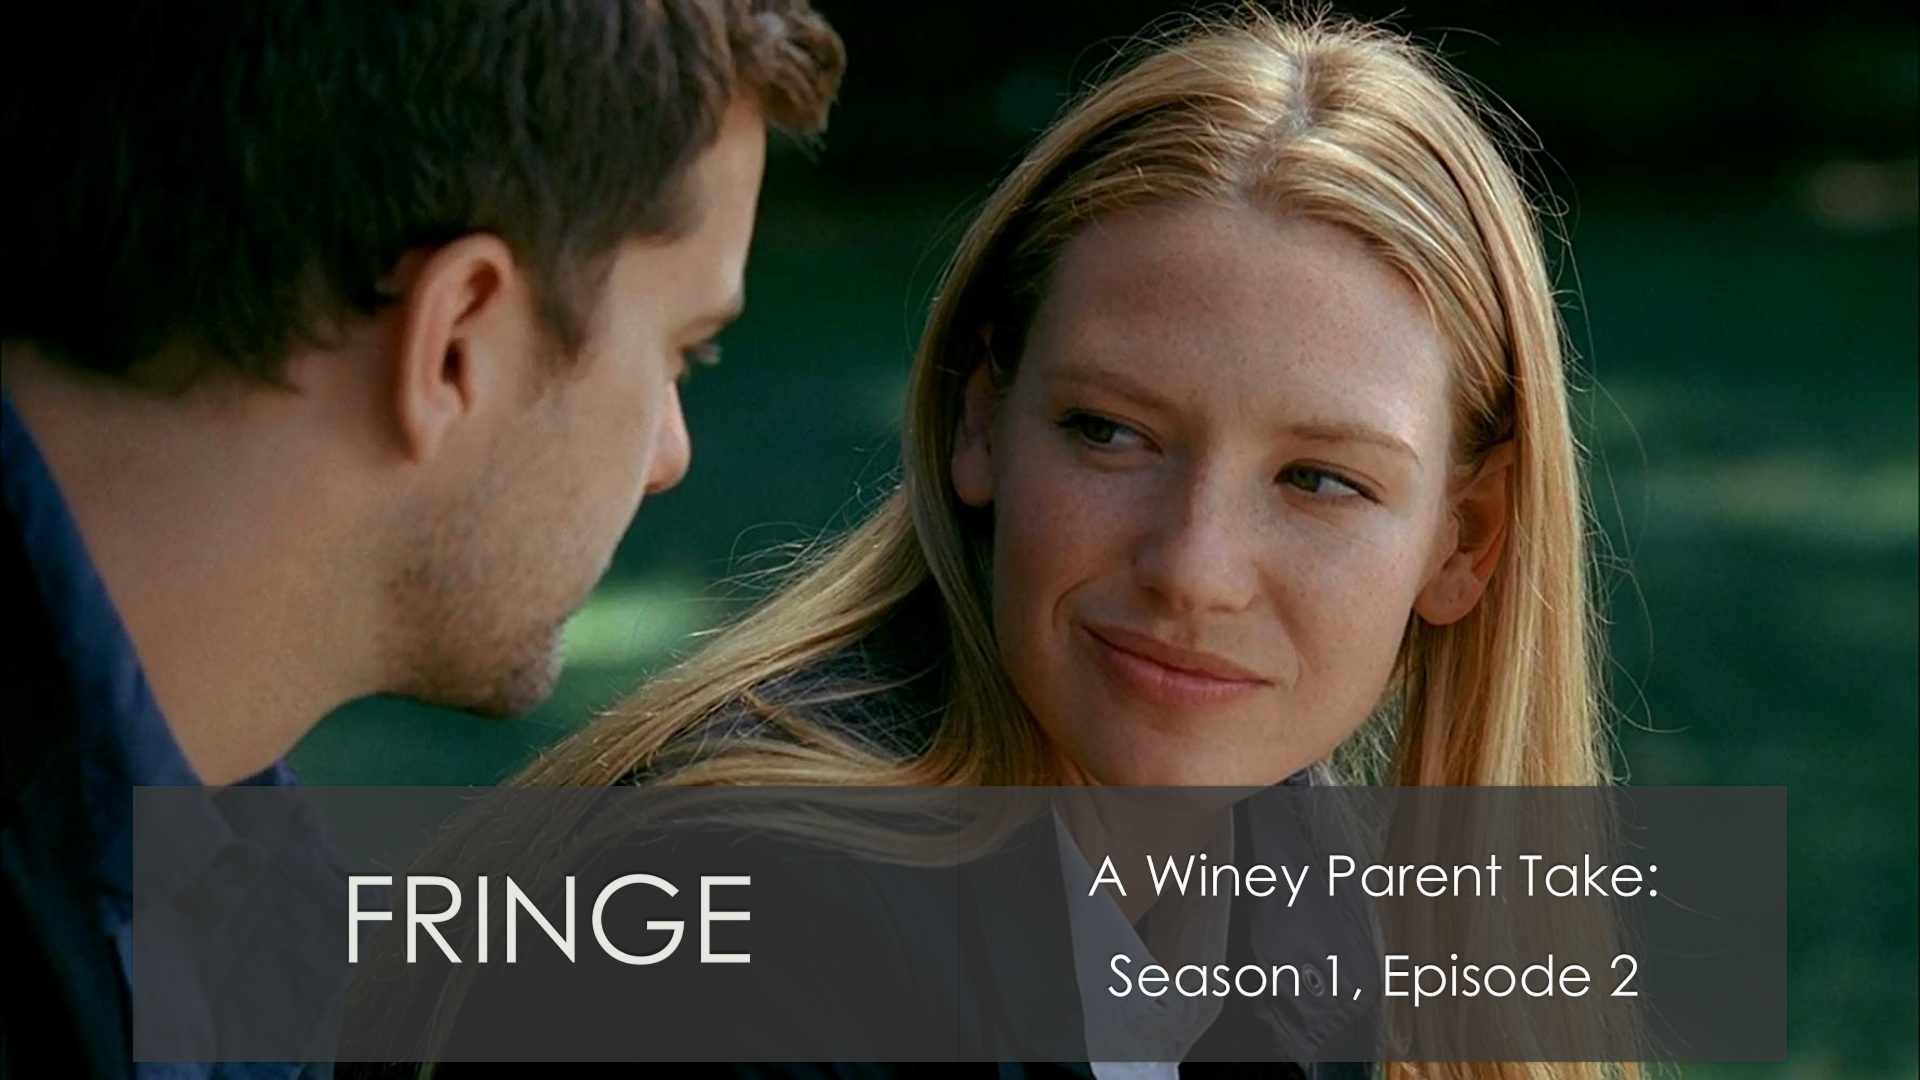 A Winey Parent Take: Fringe Season 1 Episode 2